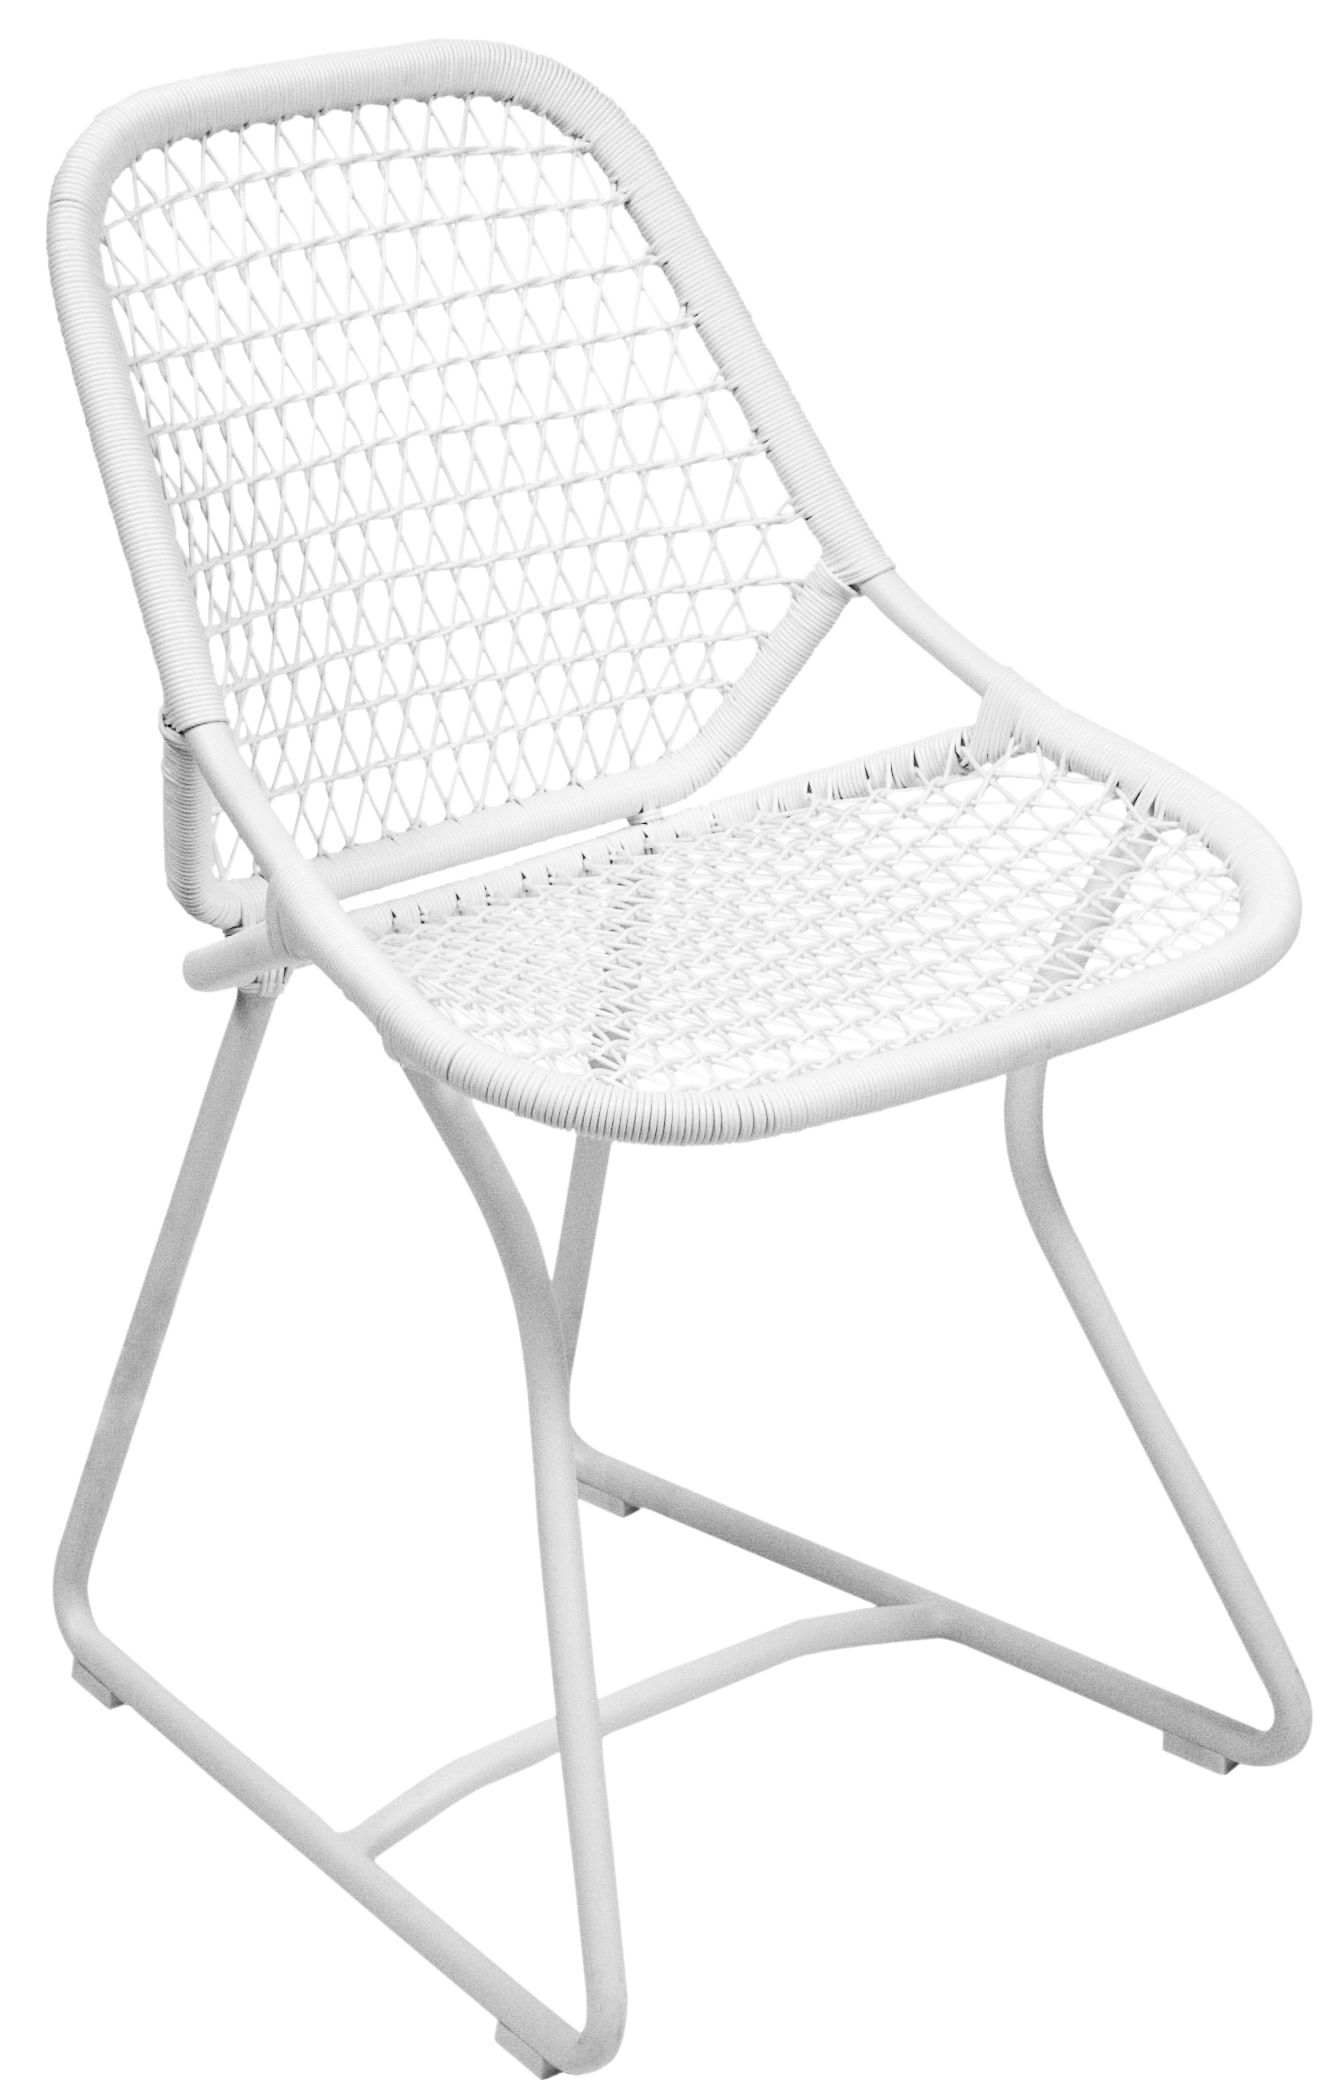 Möbel - Stühle  - Sixties Stuhl - Fermob - Baumwollweiß / Weiß - Aluminium, Résine polymère